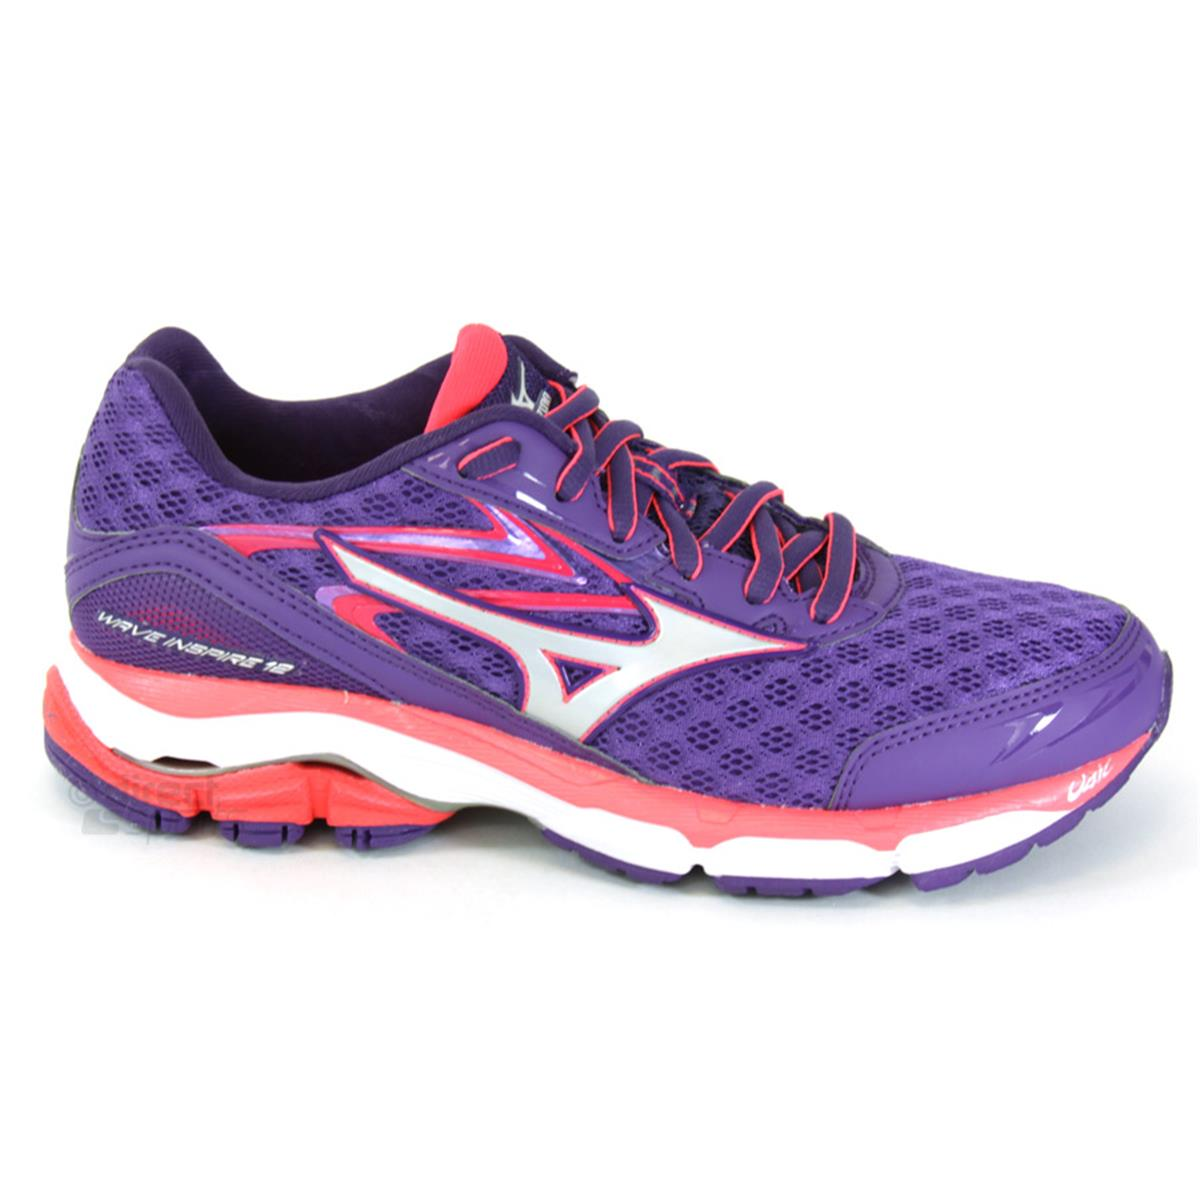 Mizuno Wave Inspire 12 Womens Running Shoes (Royal Purple-Silver-Diva Pink) a5869e0e09def